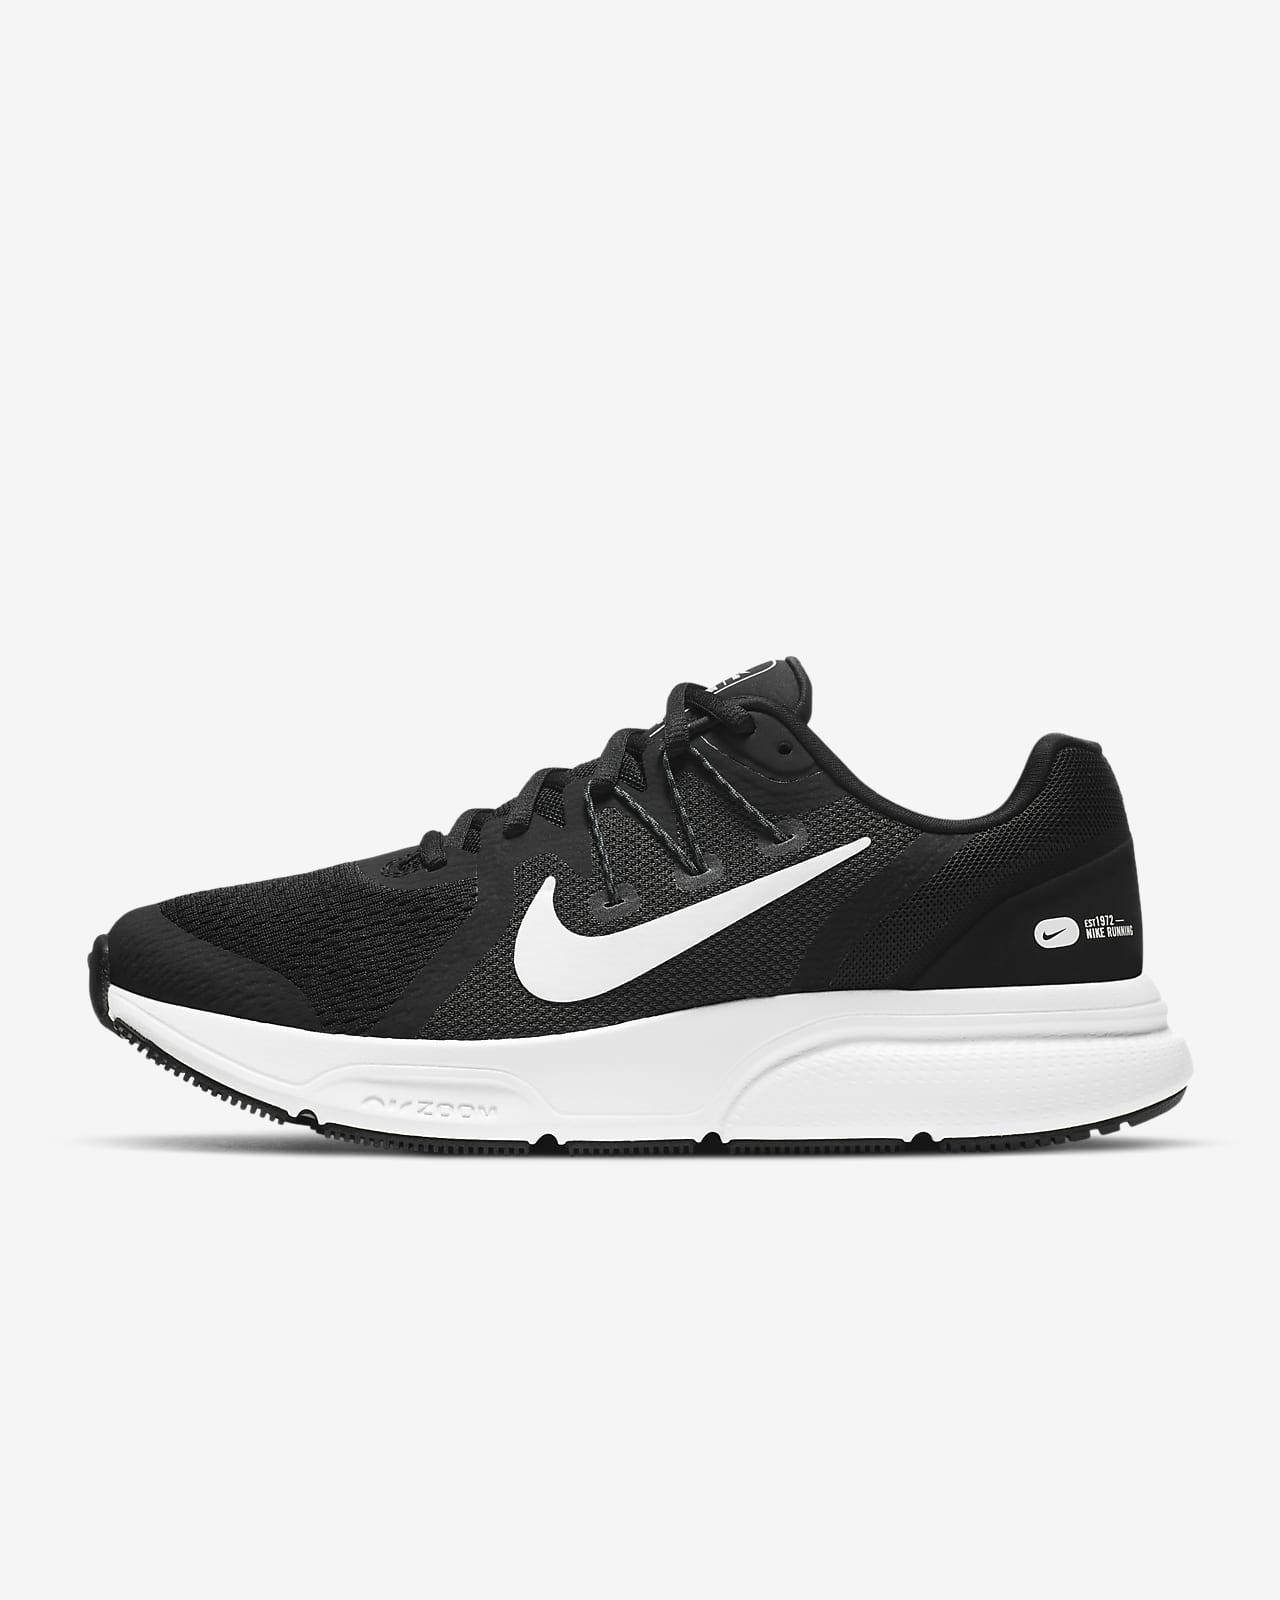 Calzado de running para mujer Nike Zoom Span 3